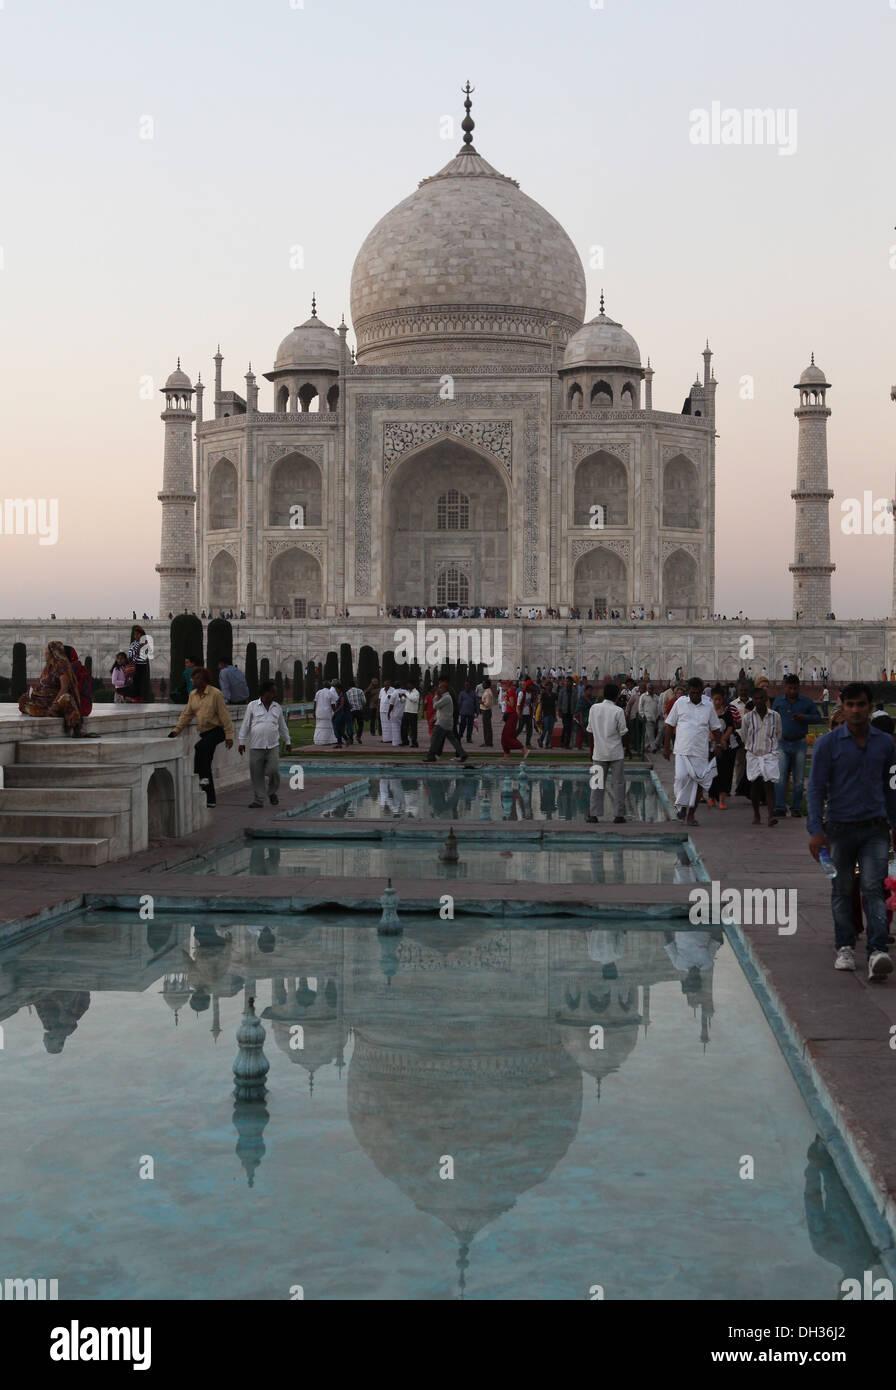 Tourists in front of the Taj Mahal, Agra, Uttar Pradesh, India, Asia - Stock Image